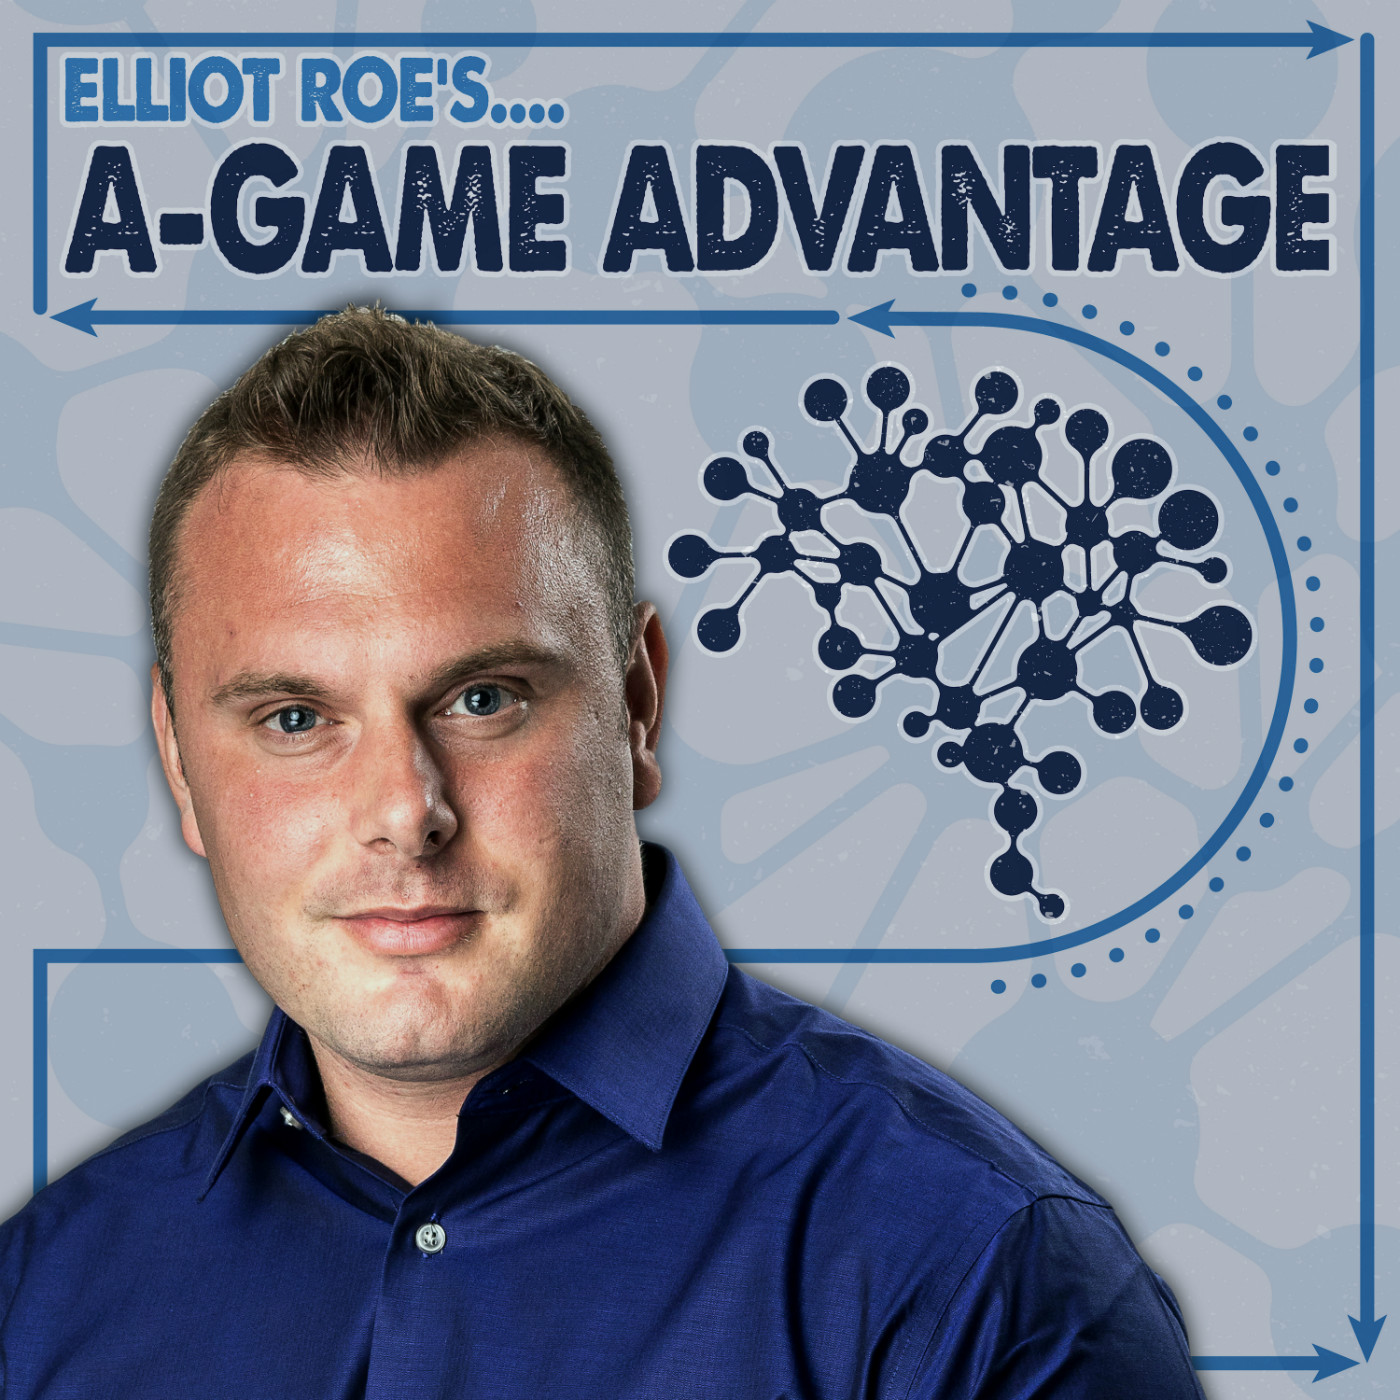 Elliot Roe's A-Game Advantage